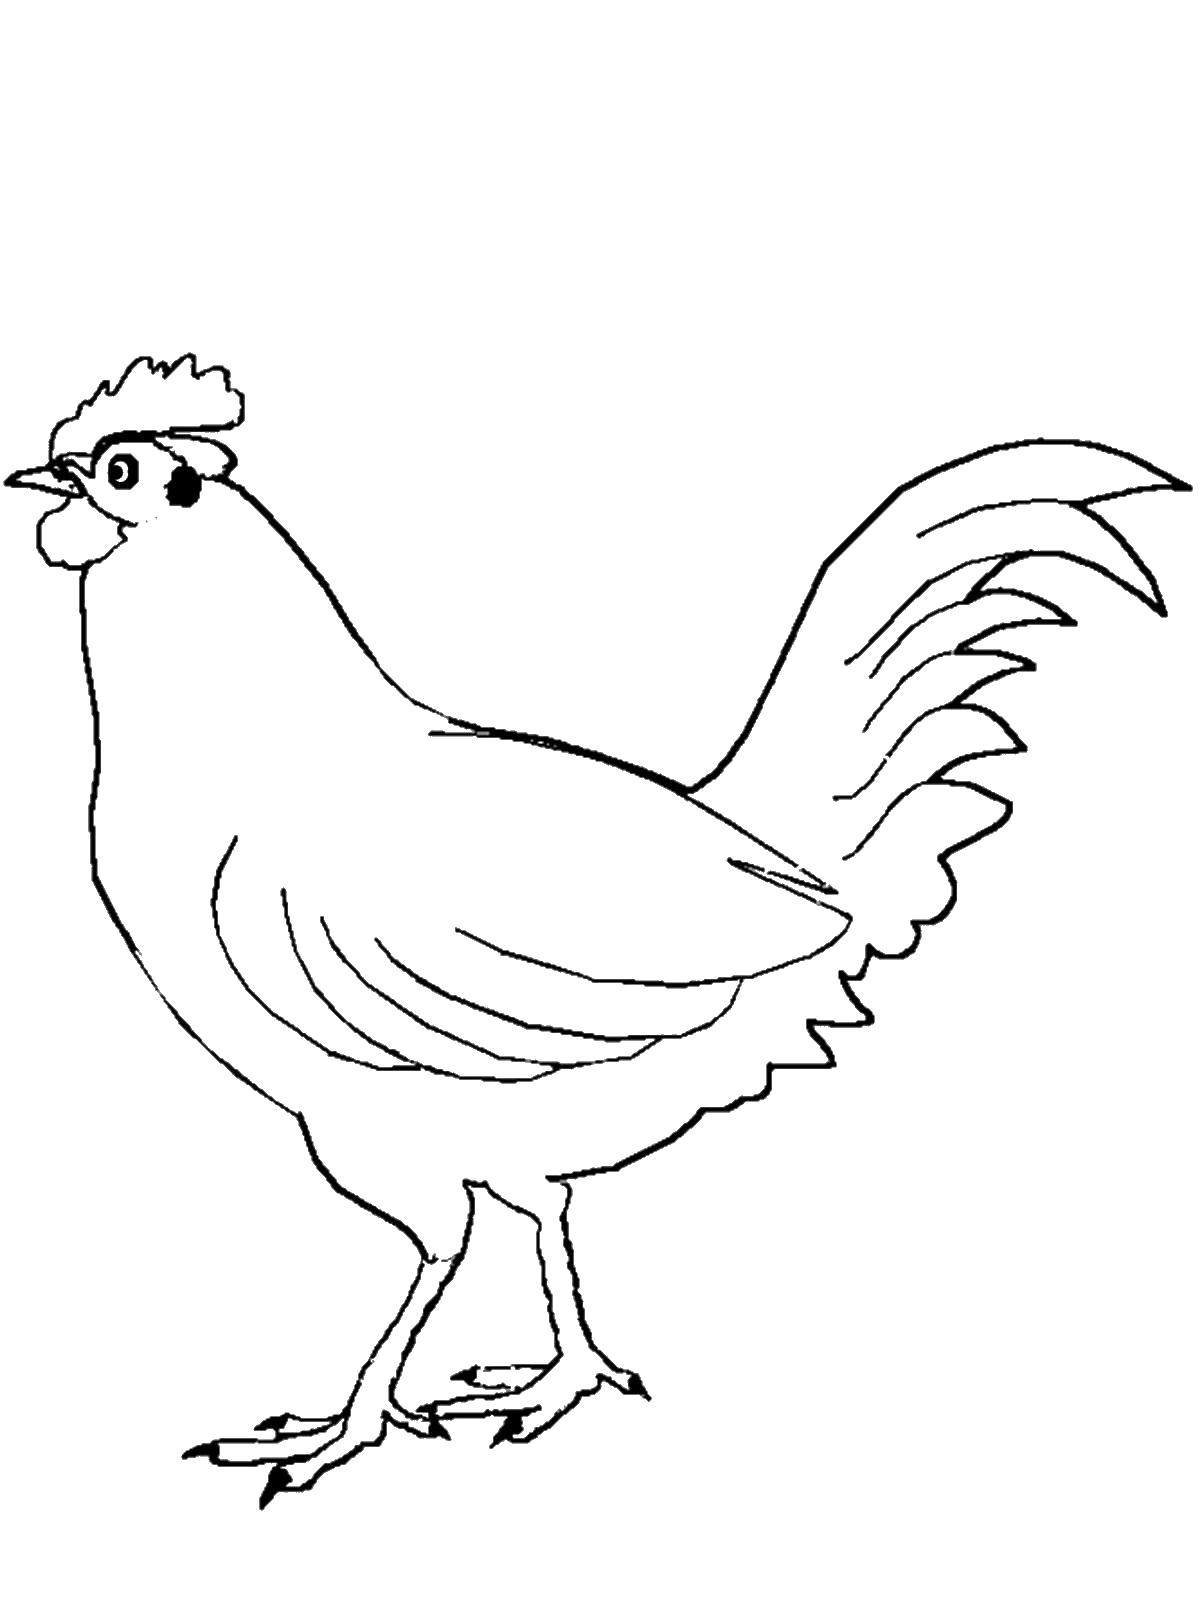 Картинки домашние птицы карандашом